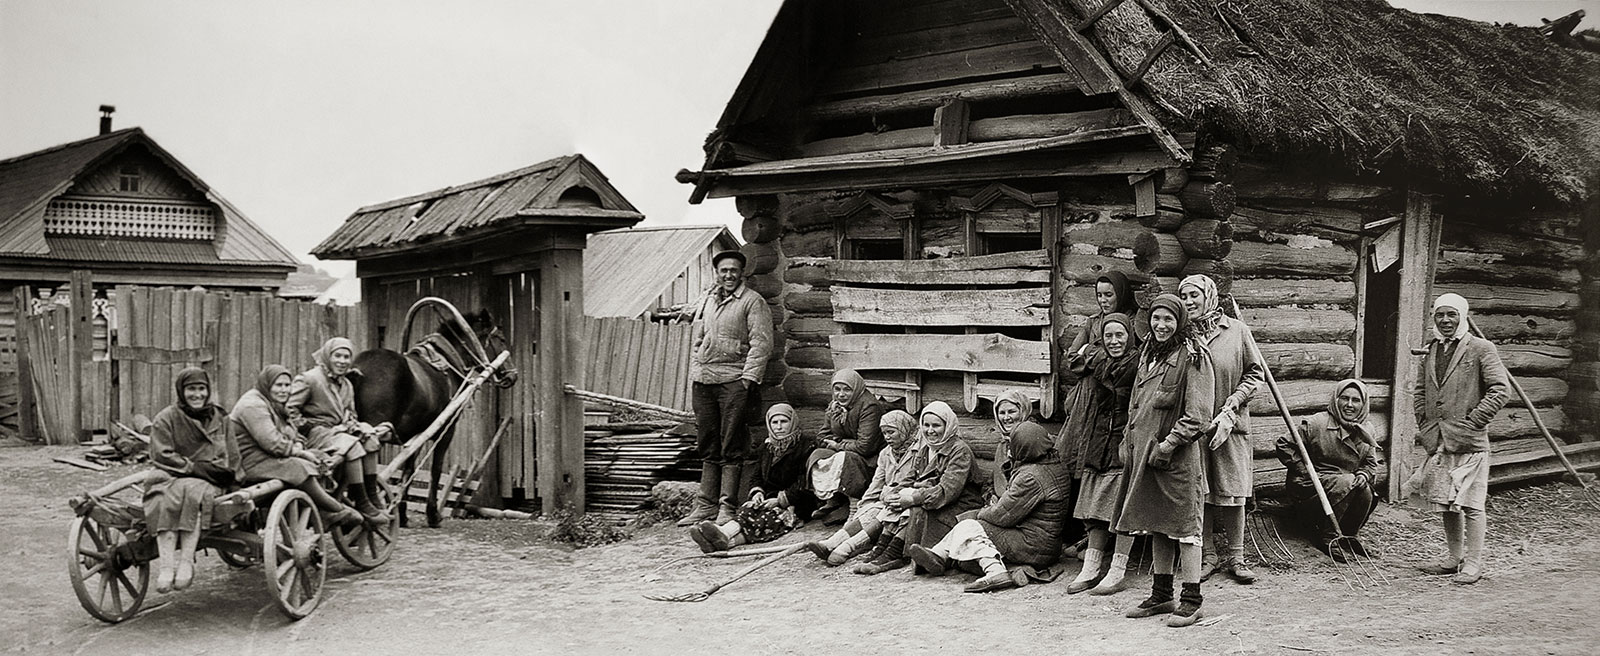 1967. В деревне Шадки